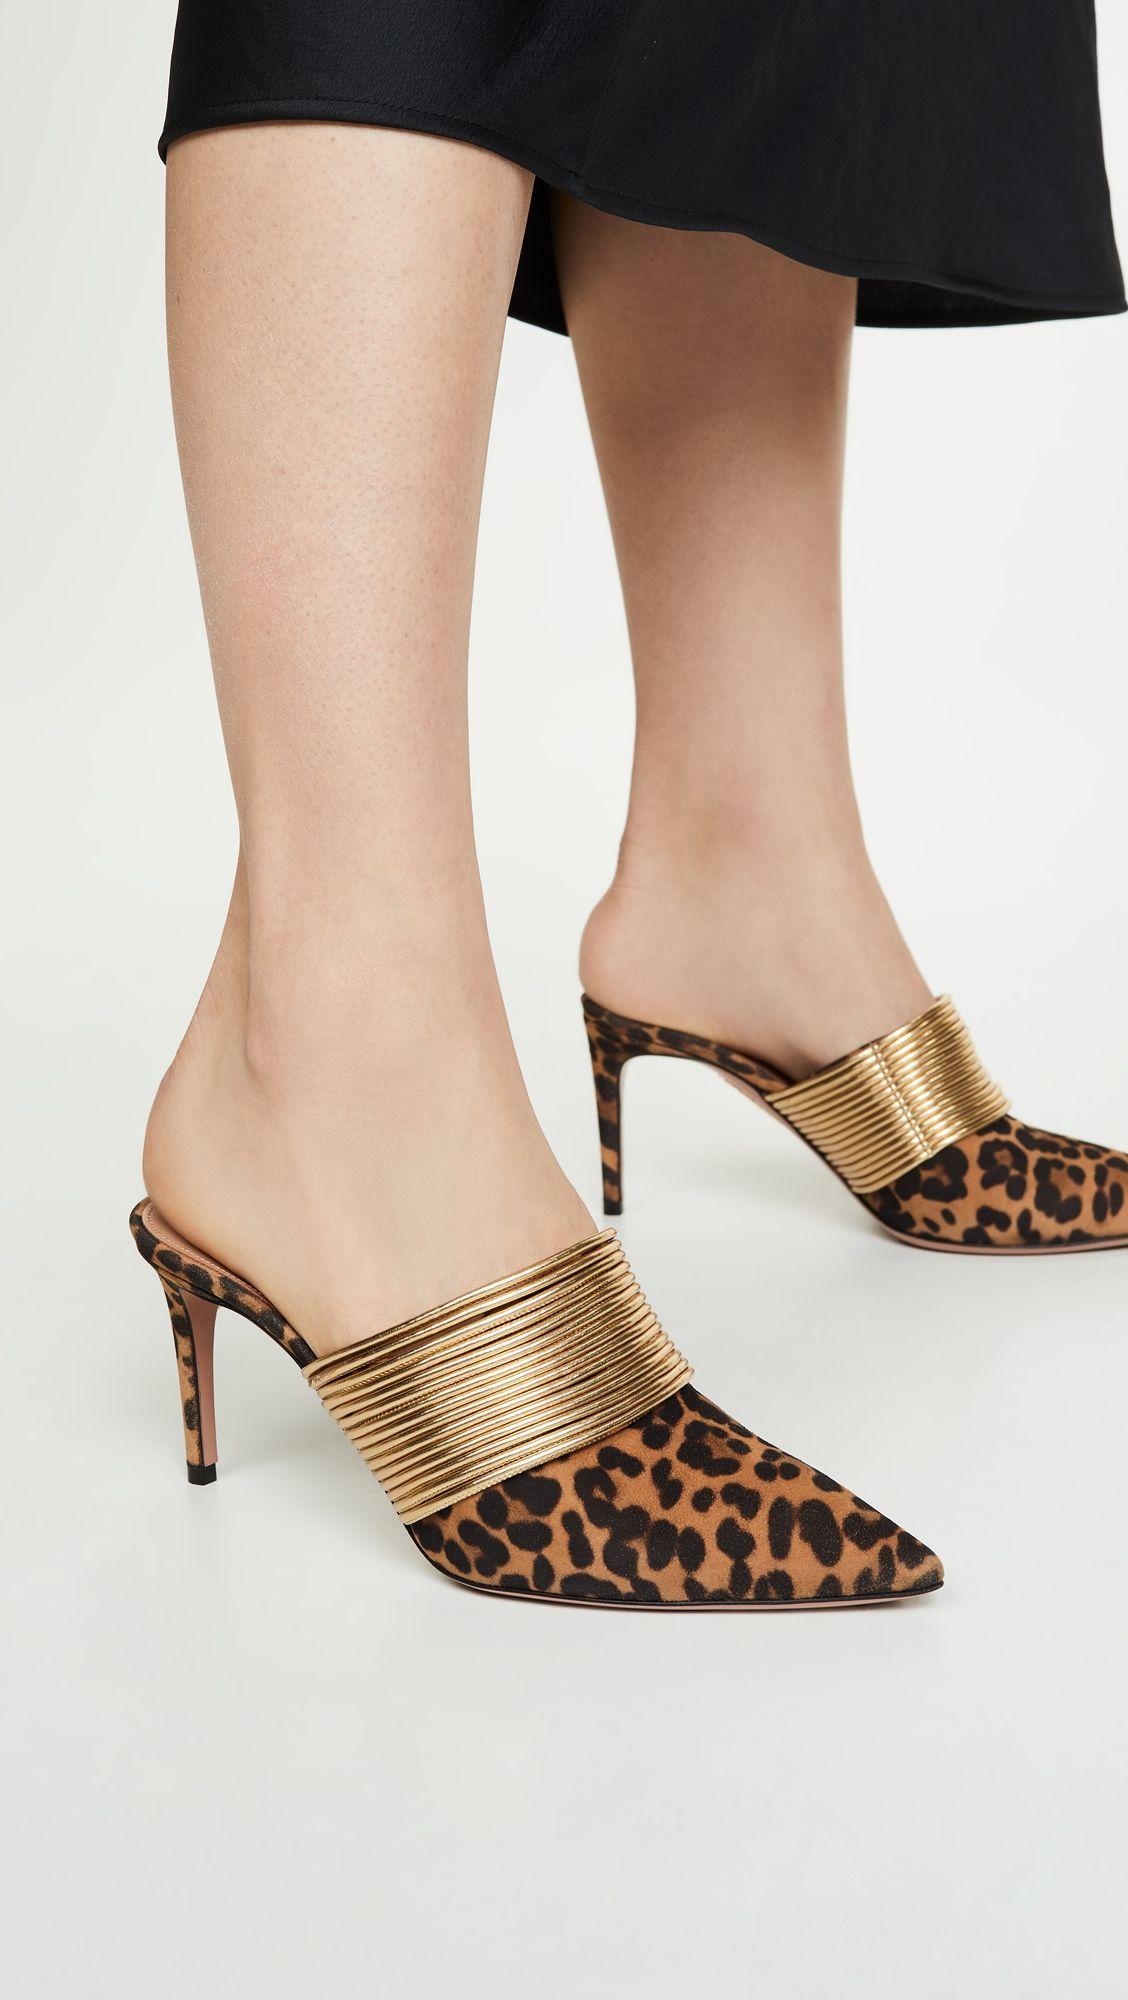 Rendez Vous 75mm Mules | Fashion heels, Heels, Giuseppe